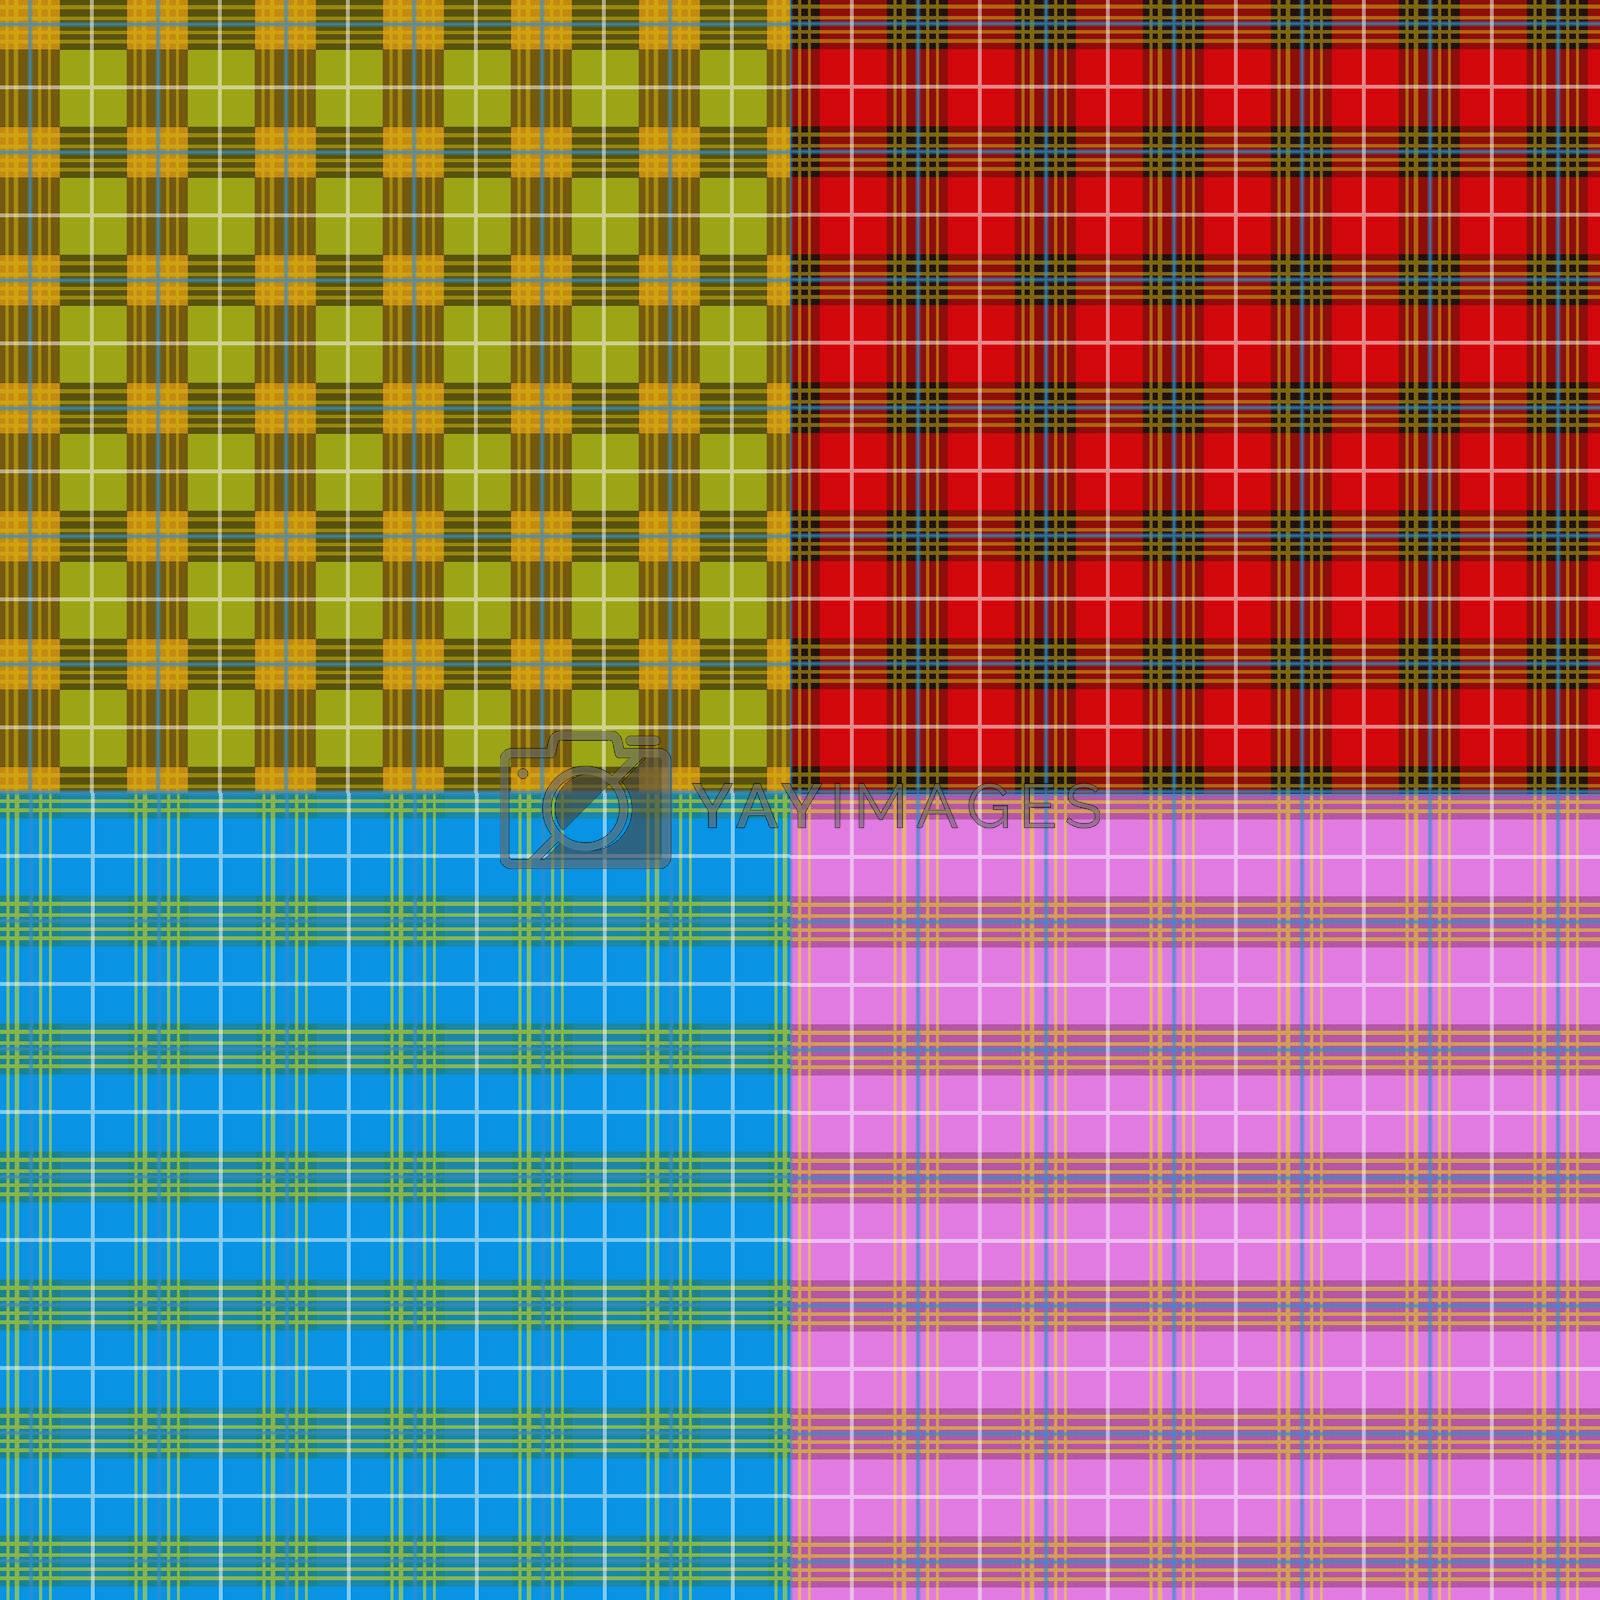 pink plaid pattern by witthaya